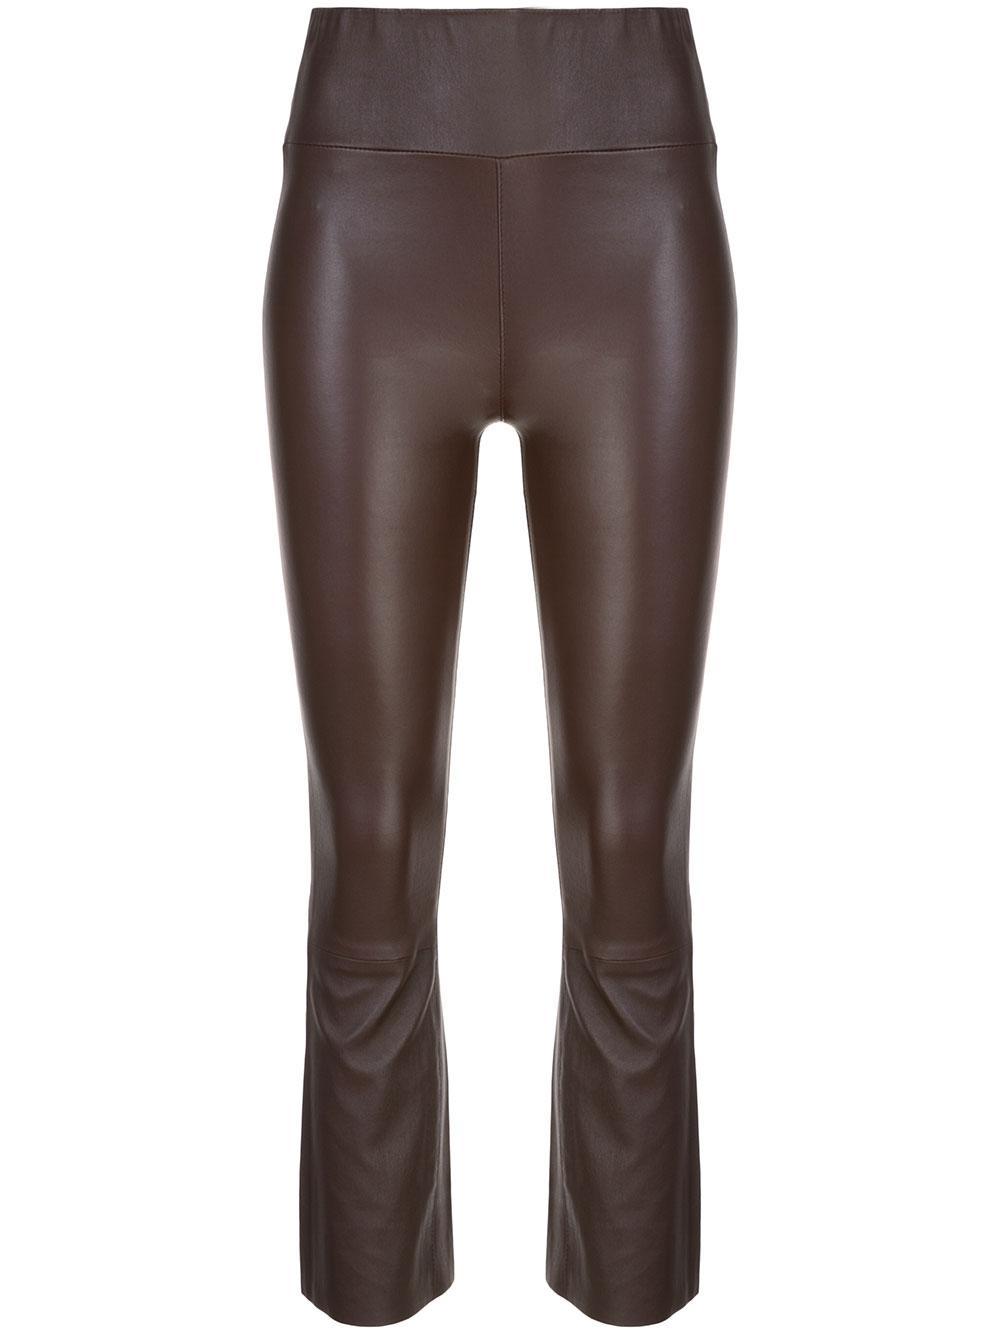 Leather High Waist Crop Flare Legging